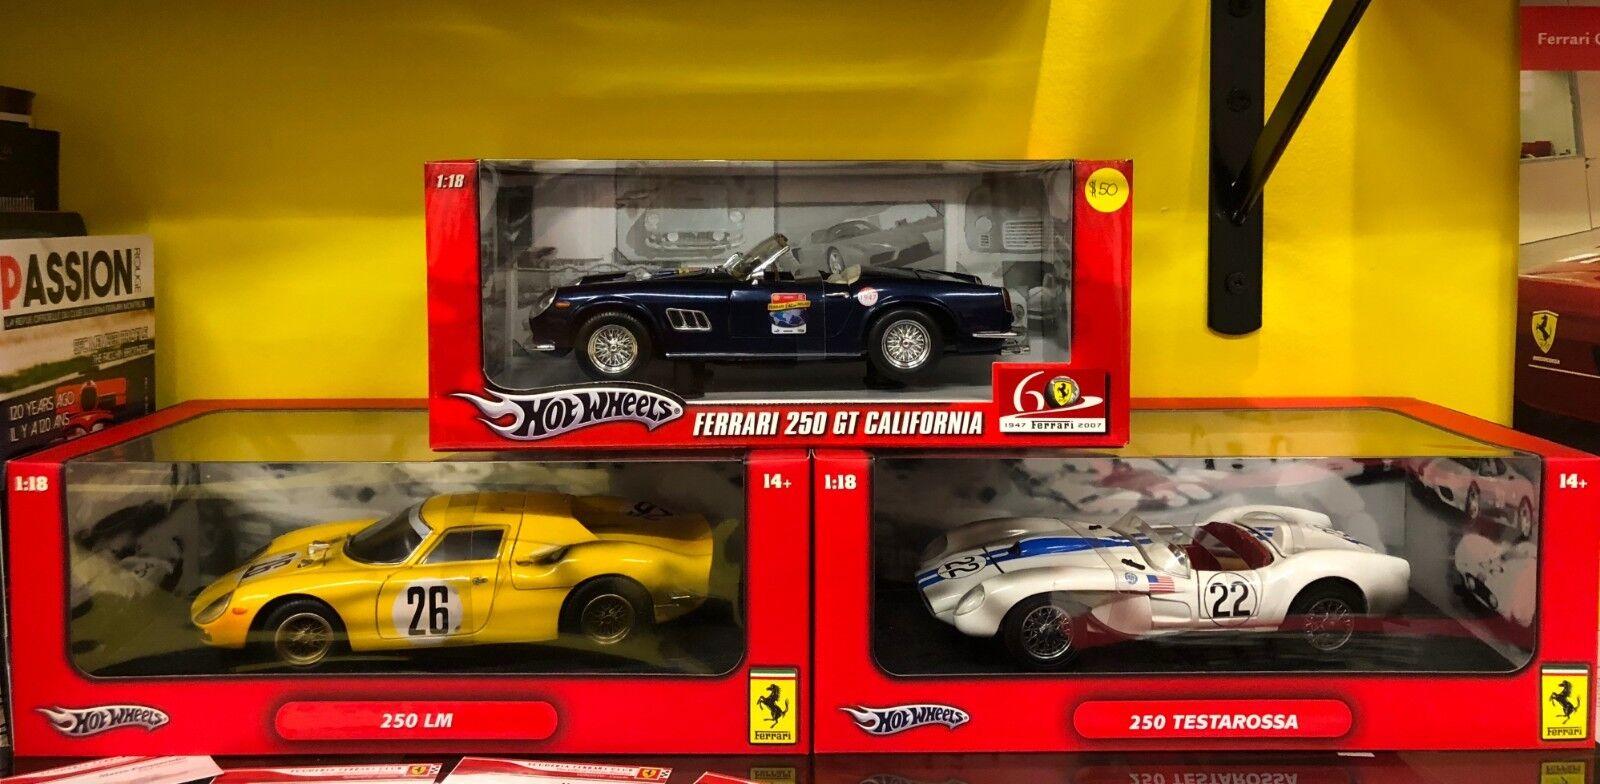 LOT OF 3 FERRARI CARS 1 250 LeMANS, 1 250 TESTAROSSA, & 1 250 GT CALIFORNIA Blau